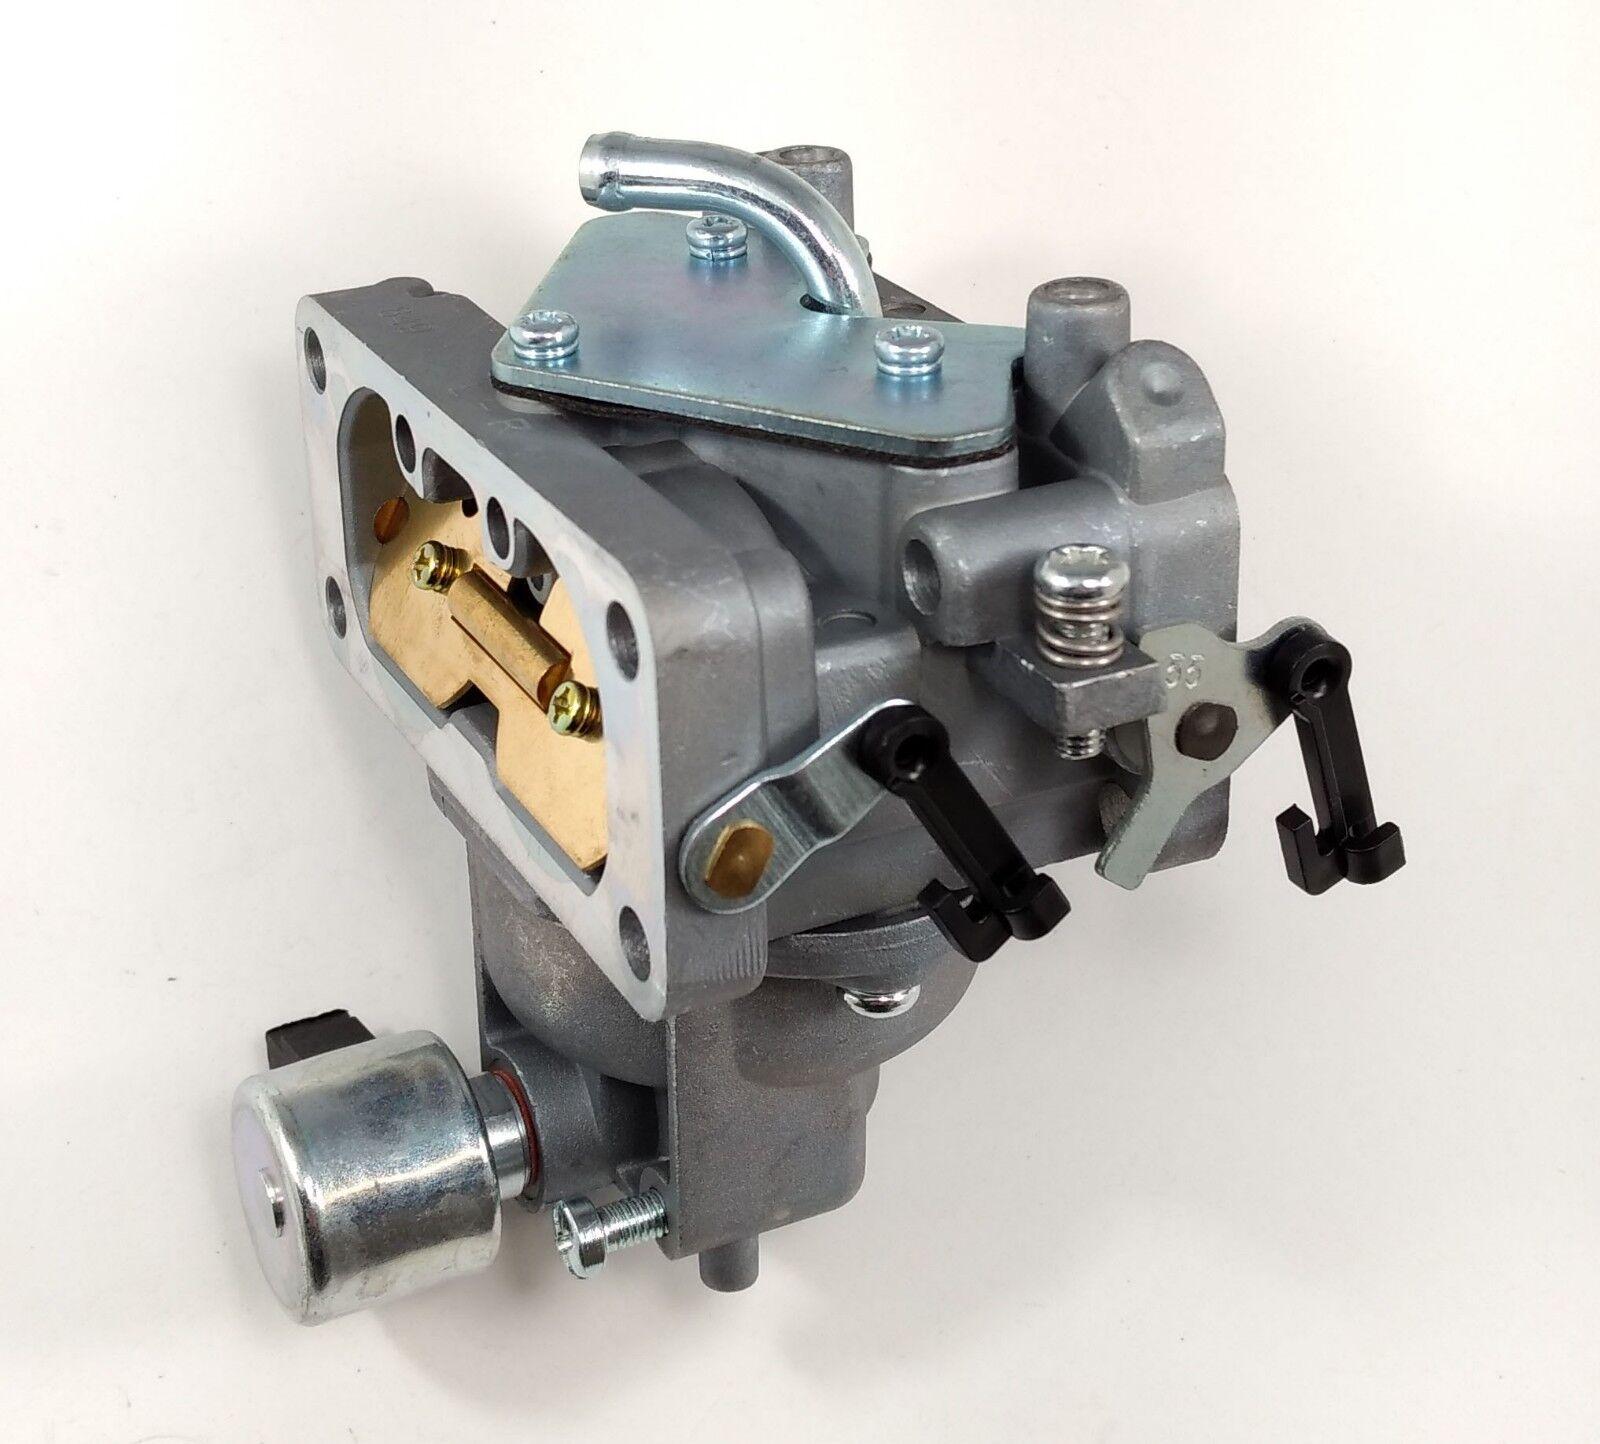 Cocheburador FIT Kawasaki 150041018 150040865 150040941 FX850V BS15 DS10 FS09 7097